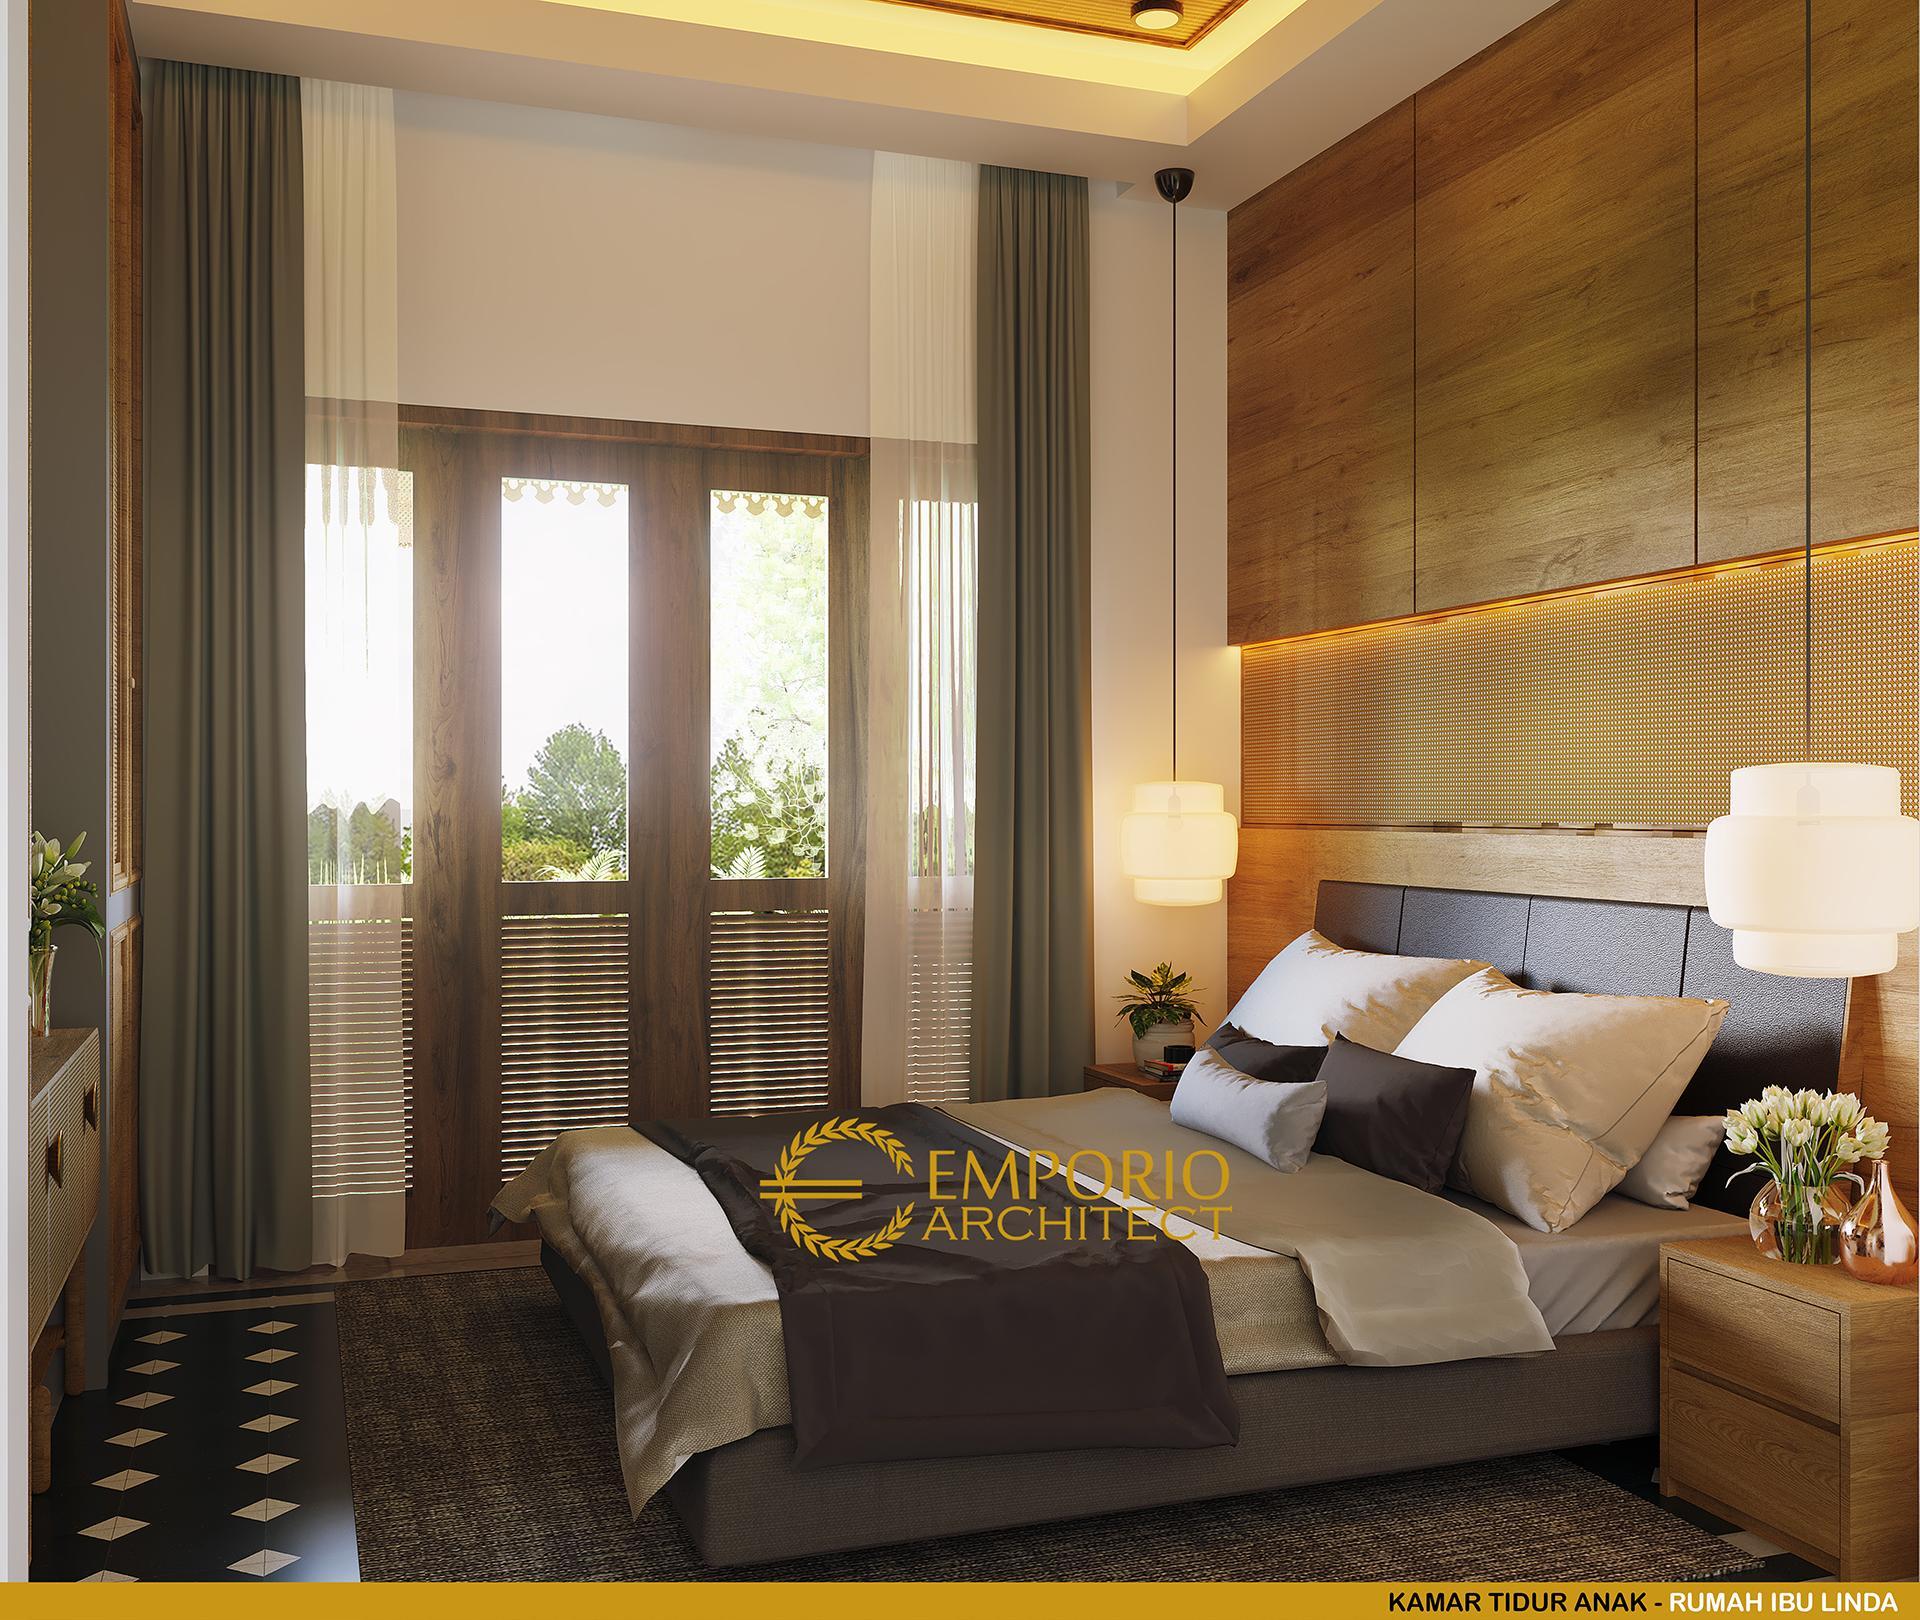 Mrs Linda Uniq House 1 Floor Design Banyuwangi Jawa Timur